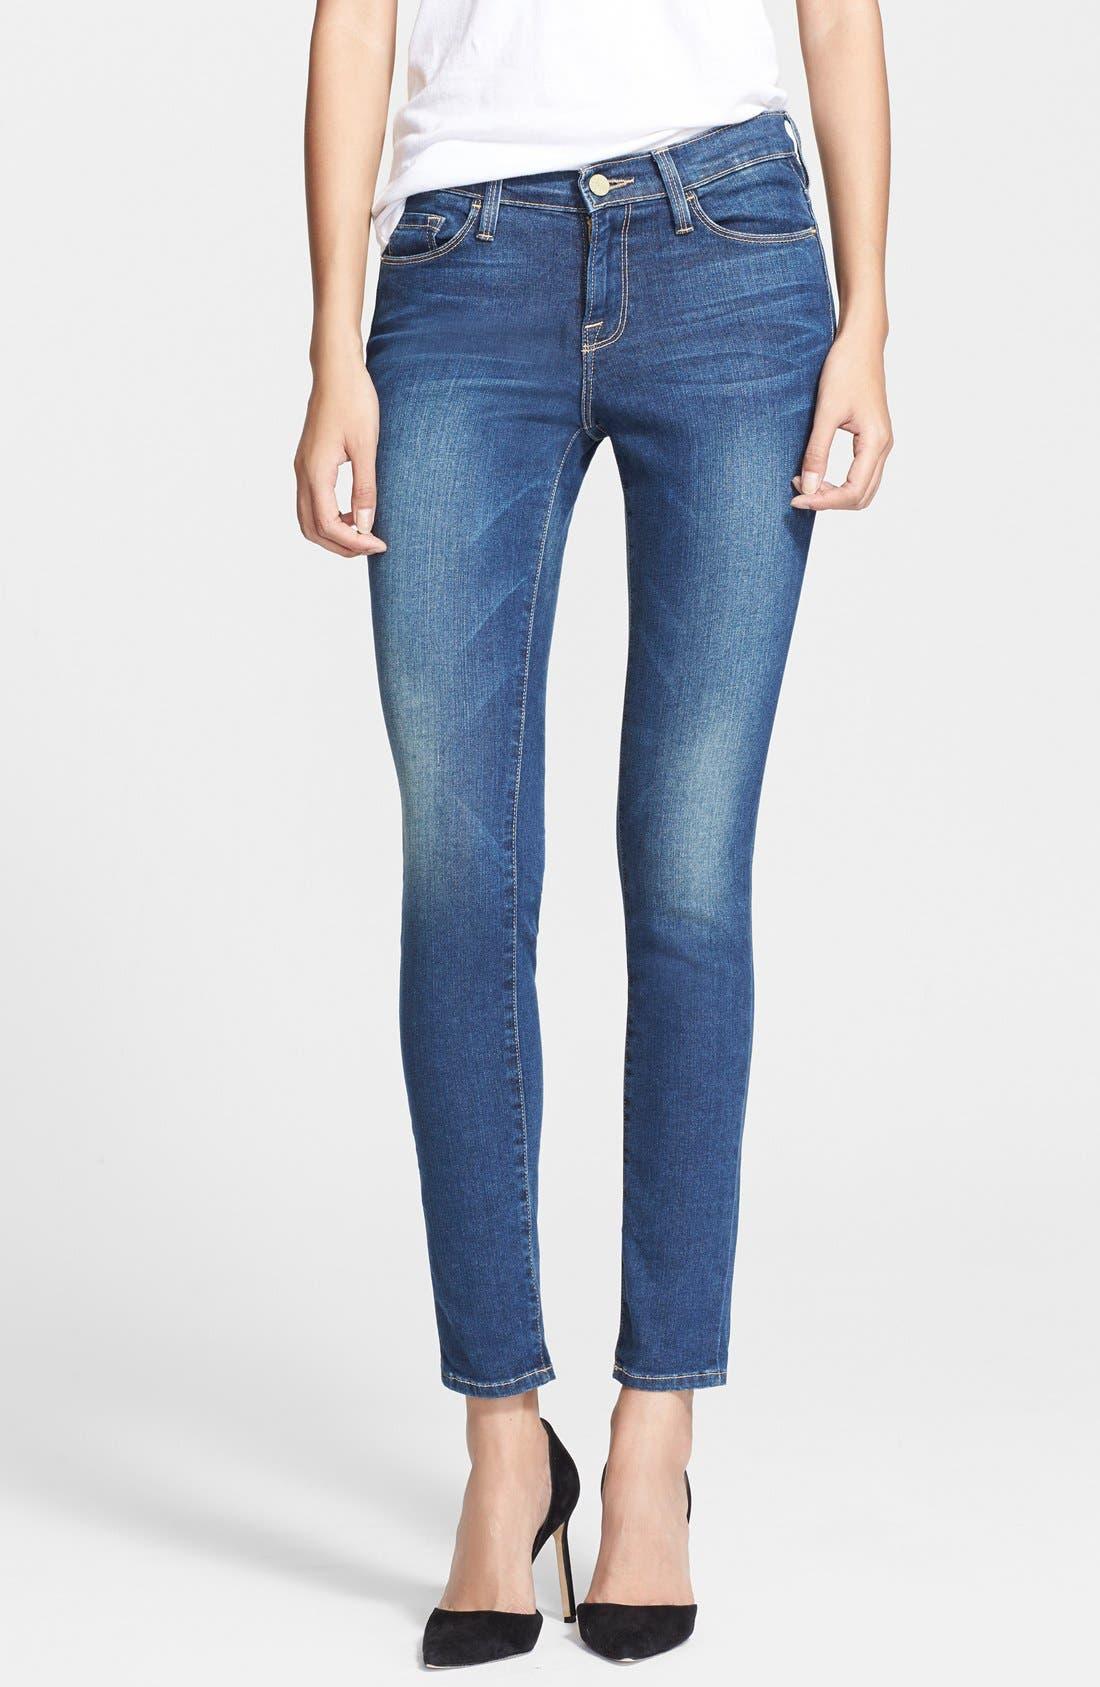 Alternate Image 1 Selected - Frame Denim 'Le Skinny de Jeanne' Jeans (Columbia Road)